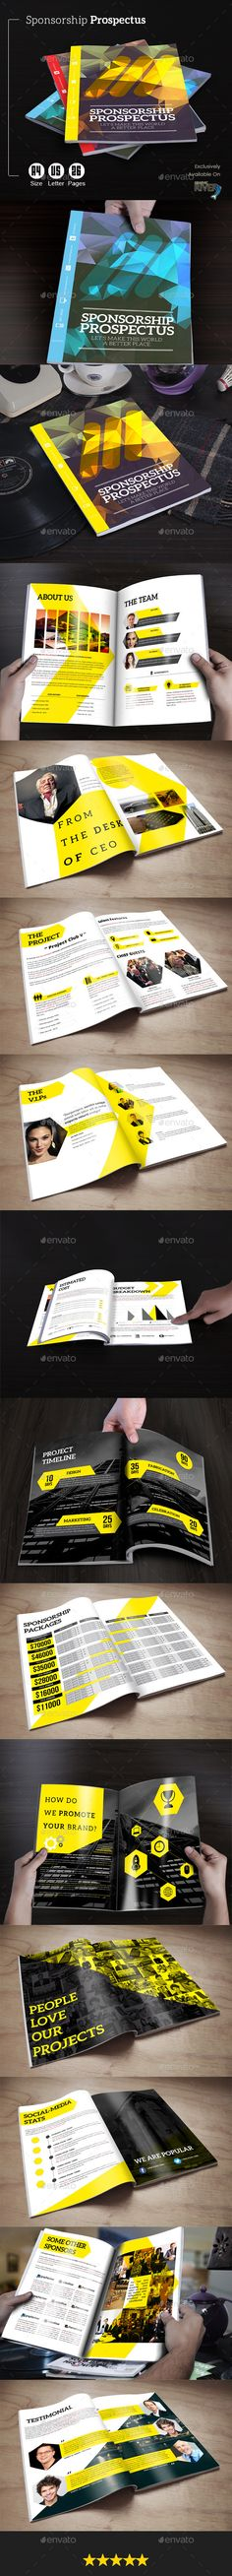 Sponsorship Prospectus Template #design Download: http://graphicriver.net/item/sponsorship-prospectus/12161993?ref=ksioks